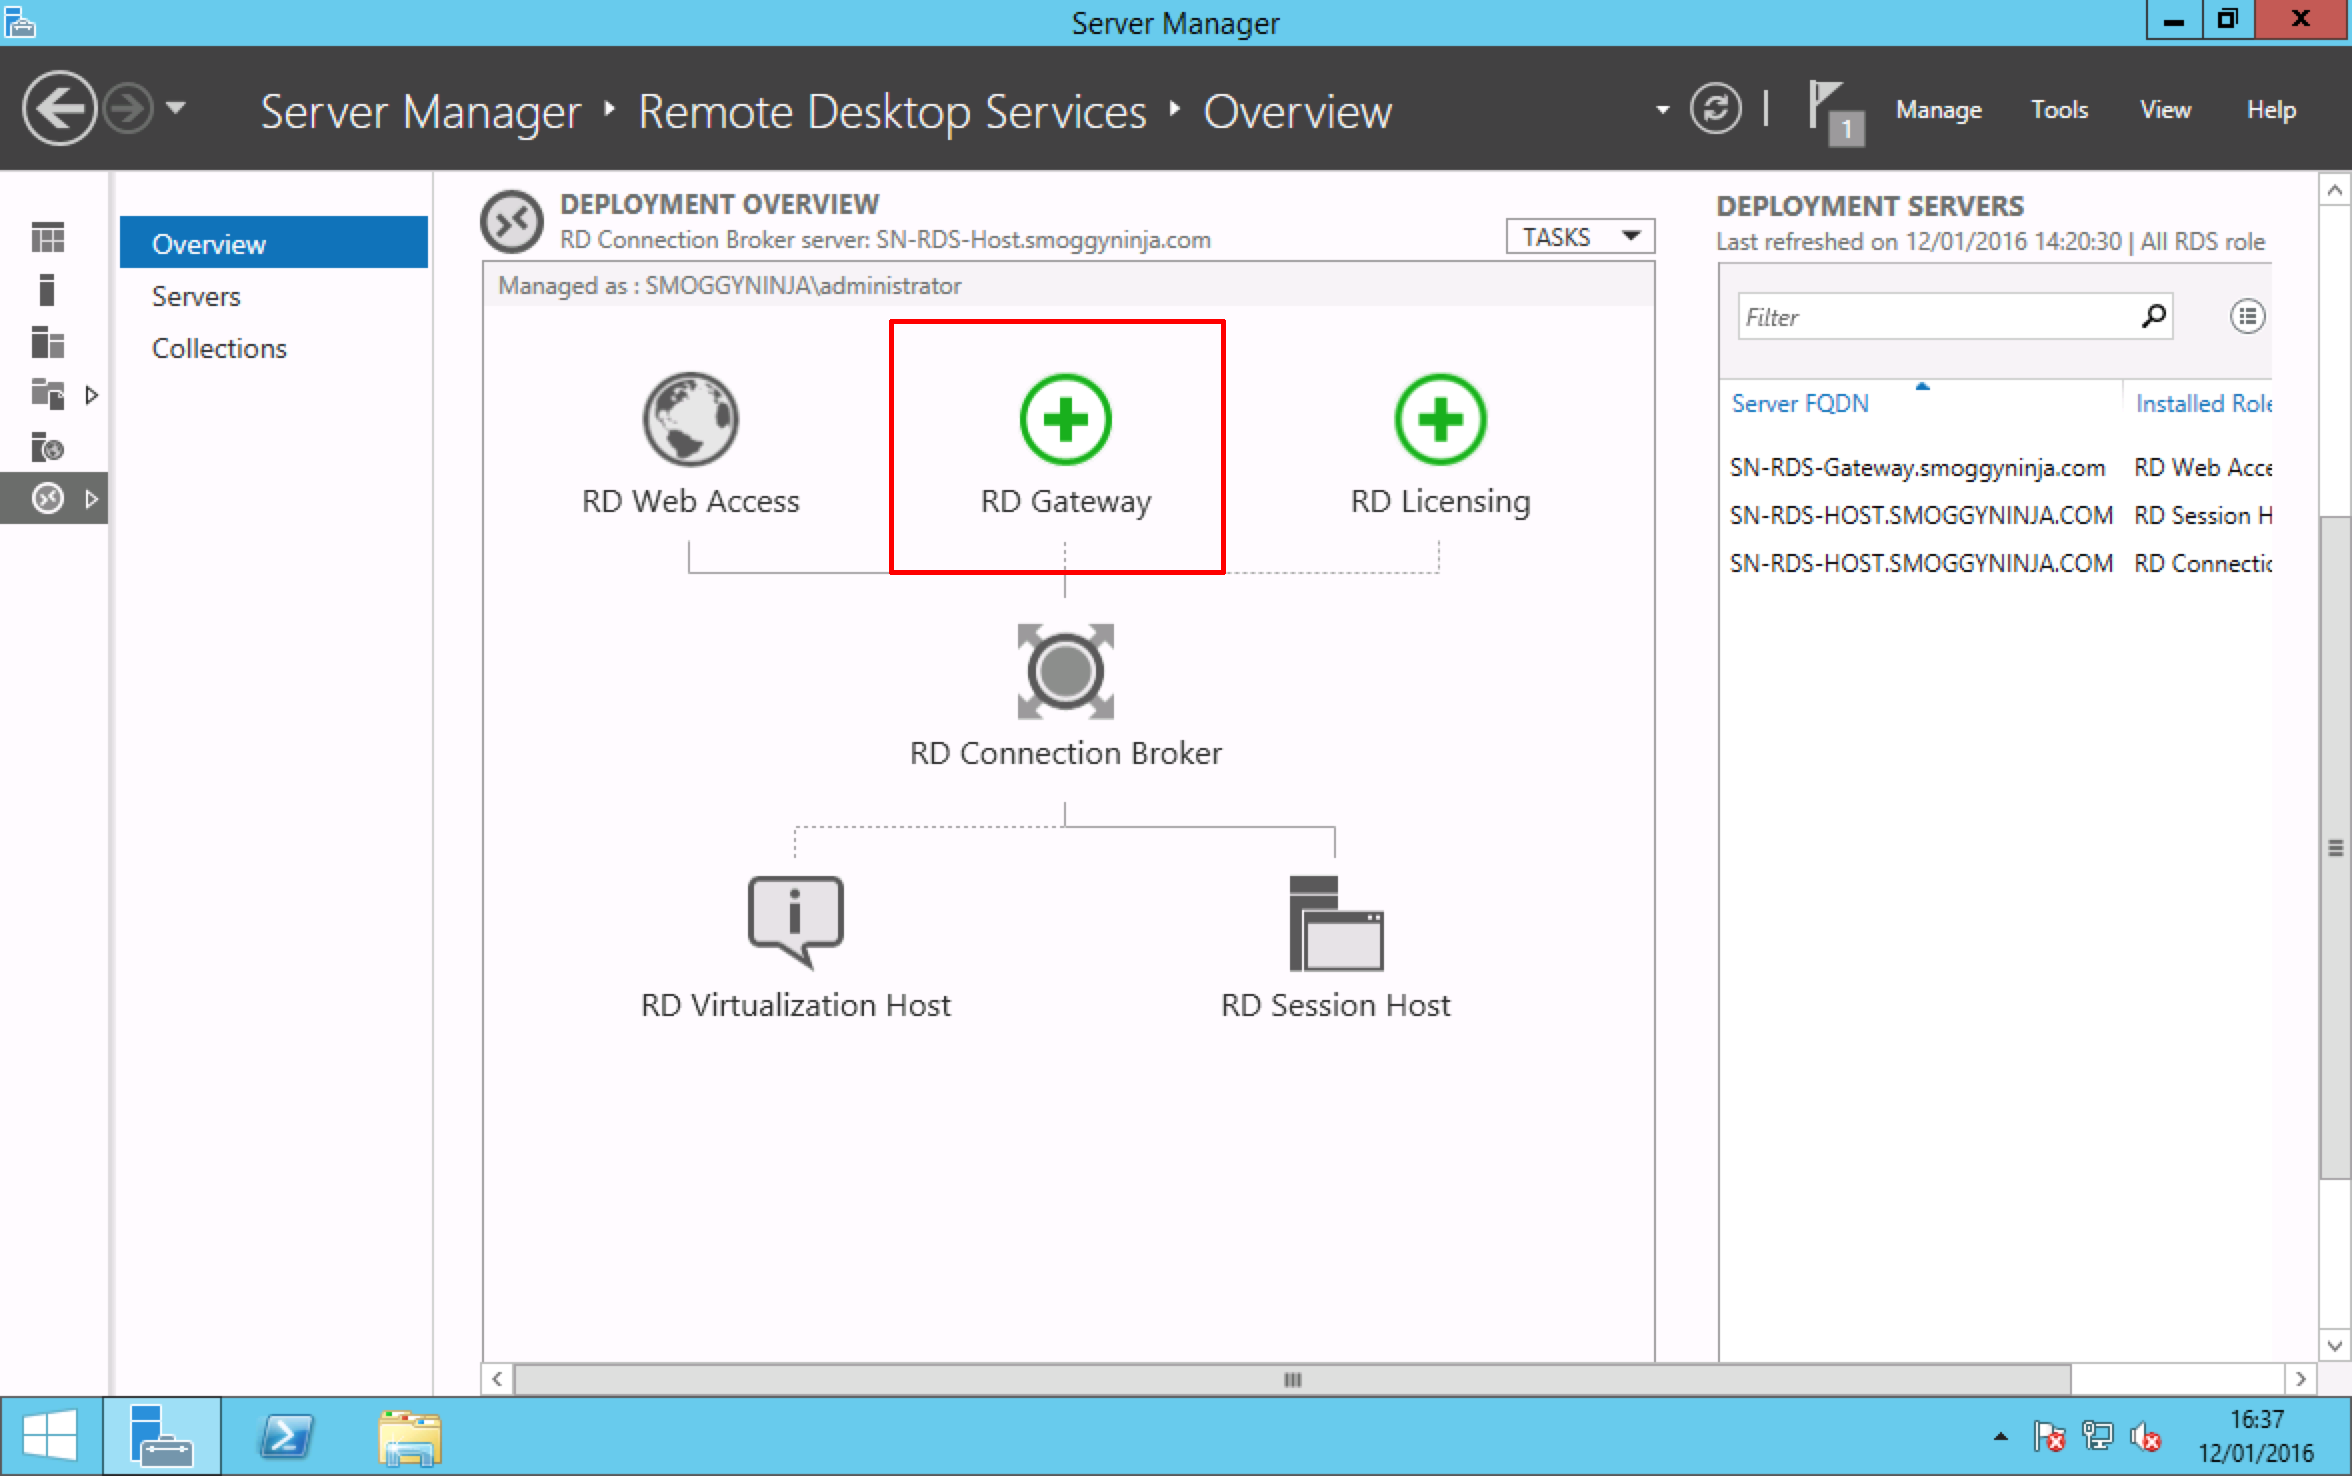 Windows Server 2012 R2 - Deploying Remote Desktop Services